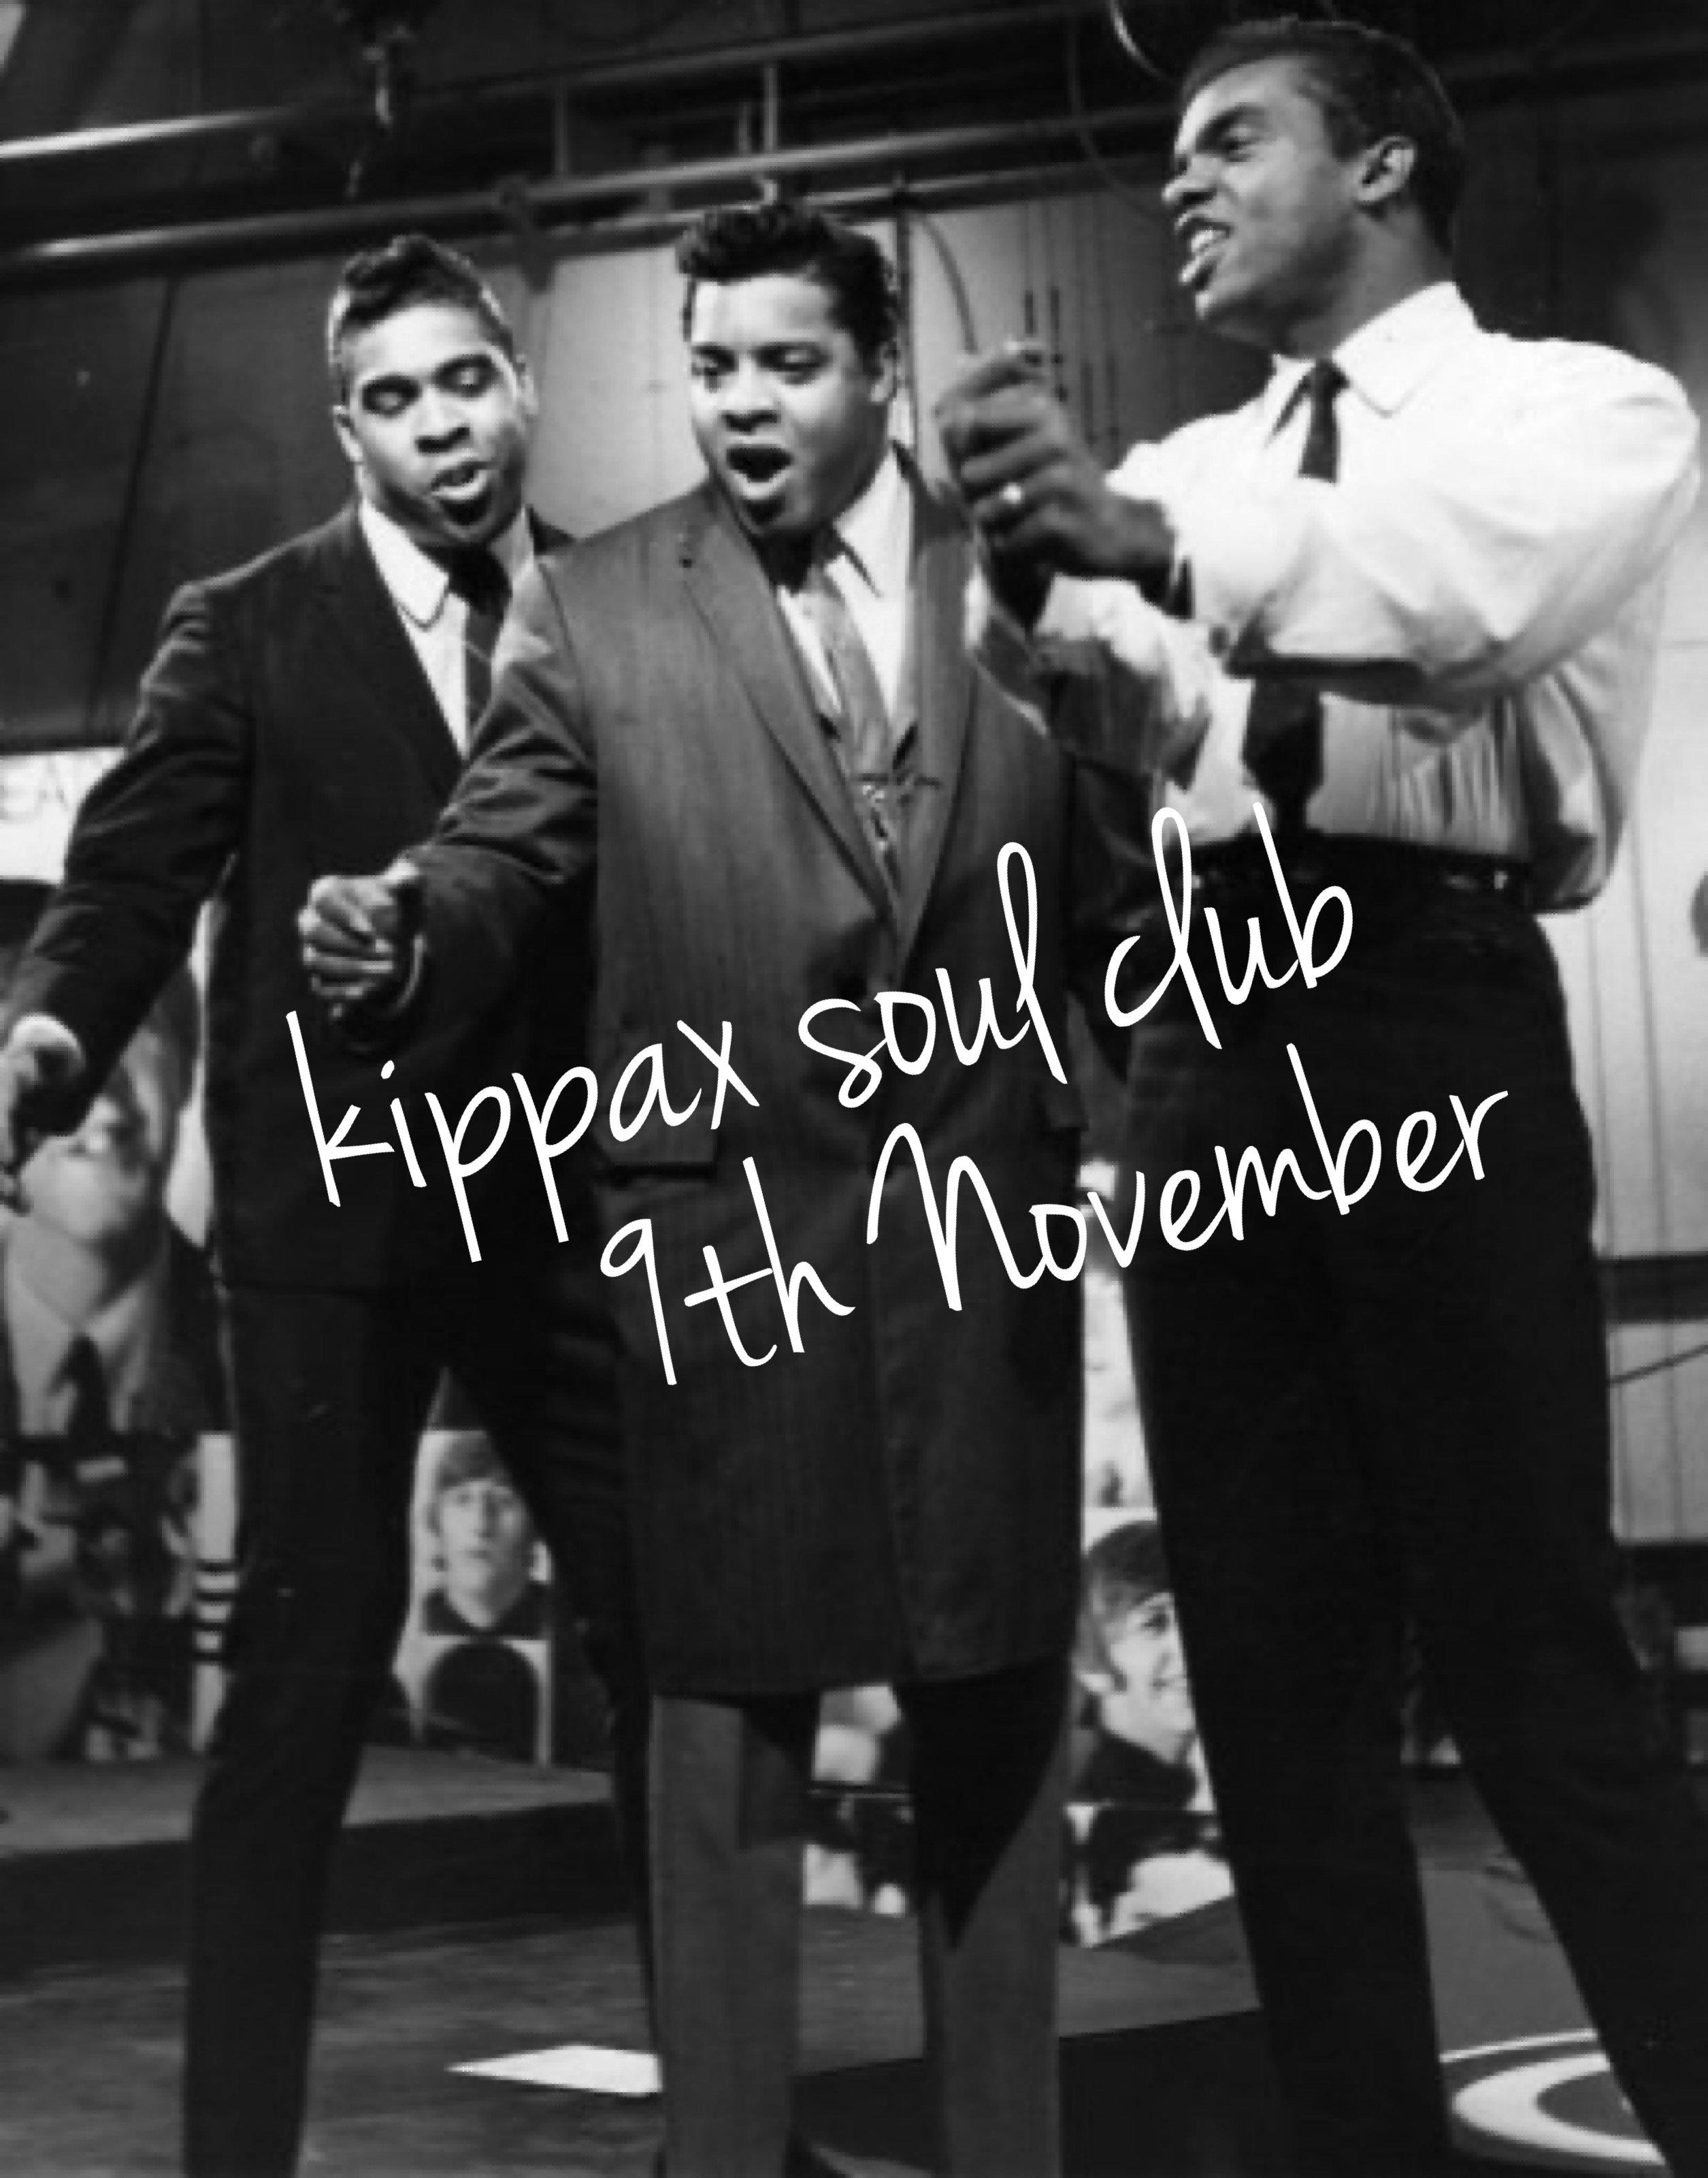 Kippax Soul Club flyer